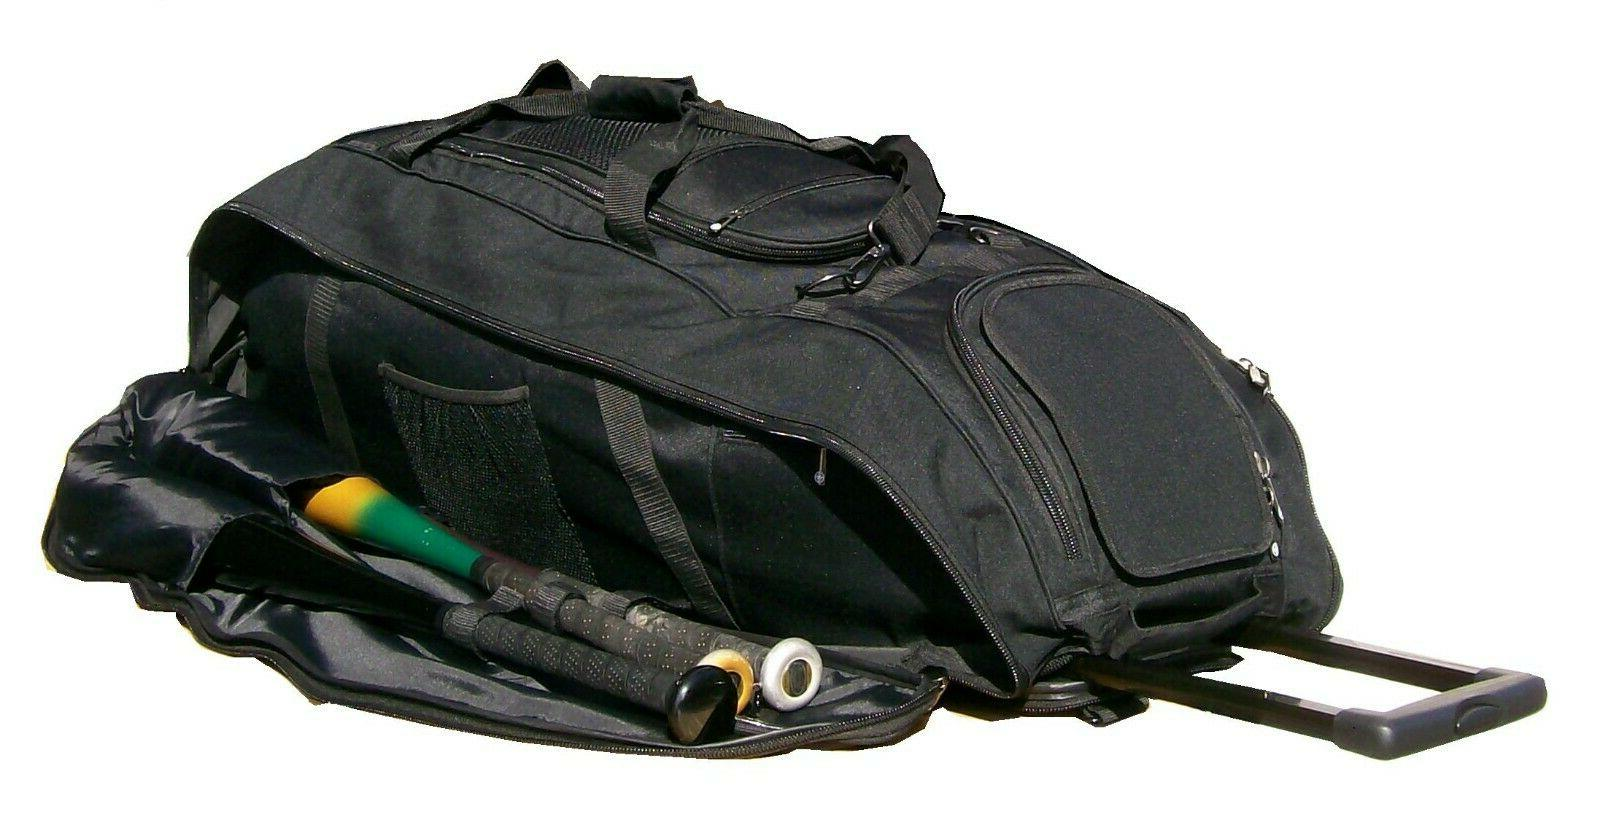 new maxballbags cobra xliii baseball softball catchers